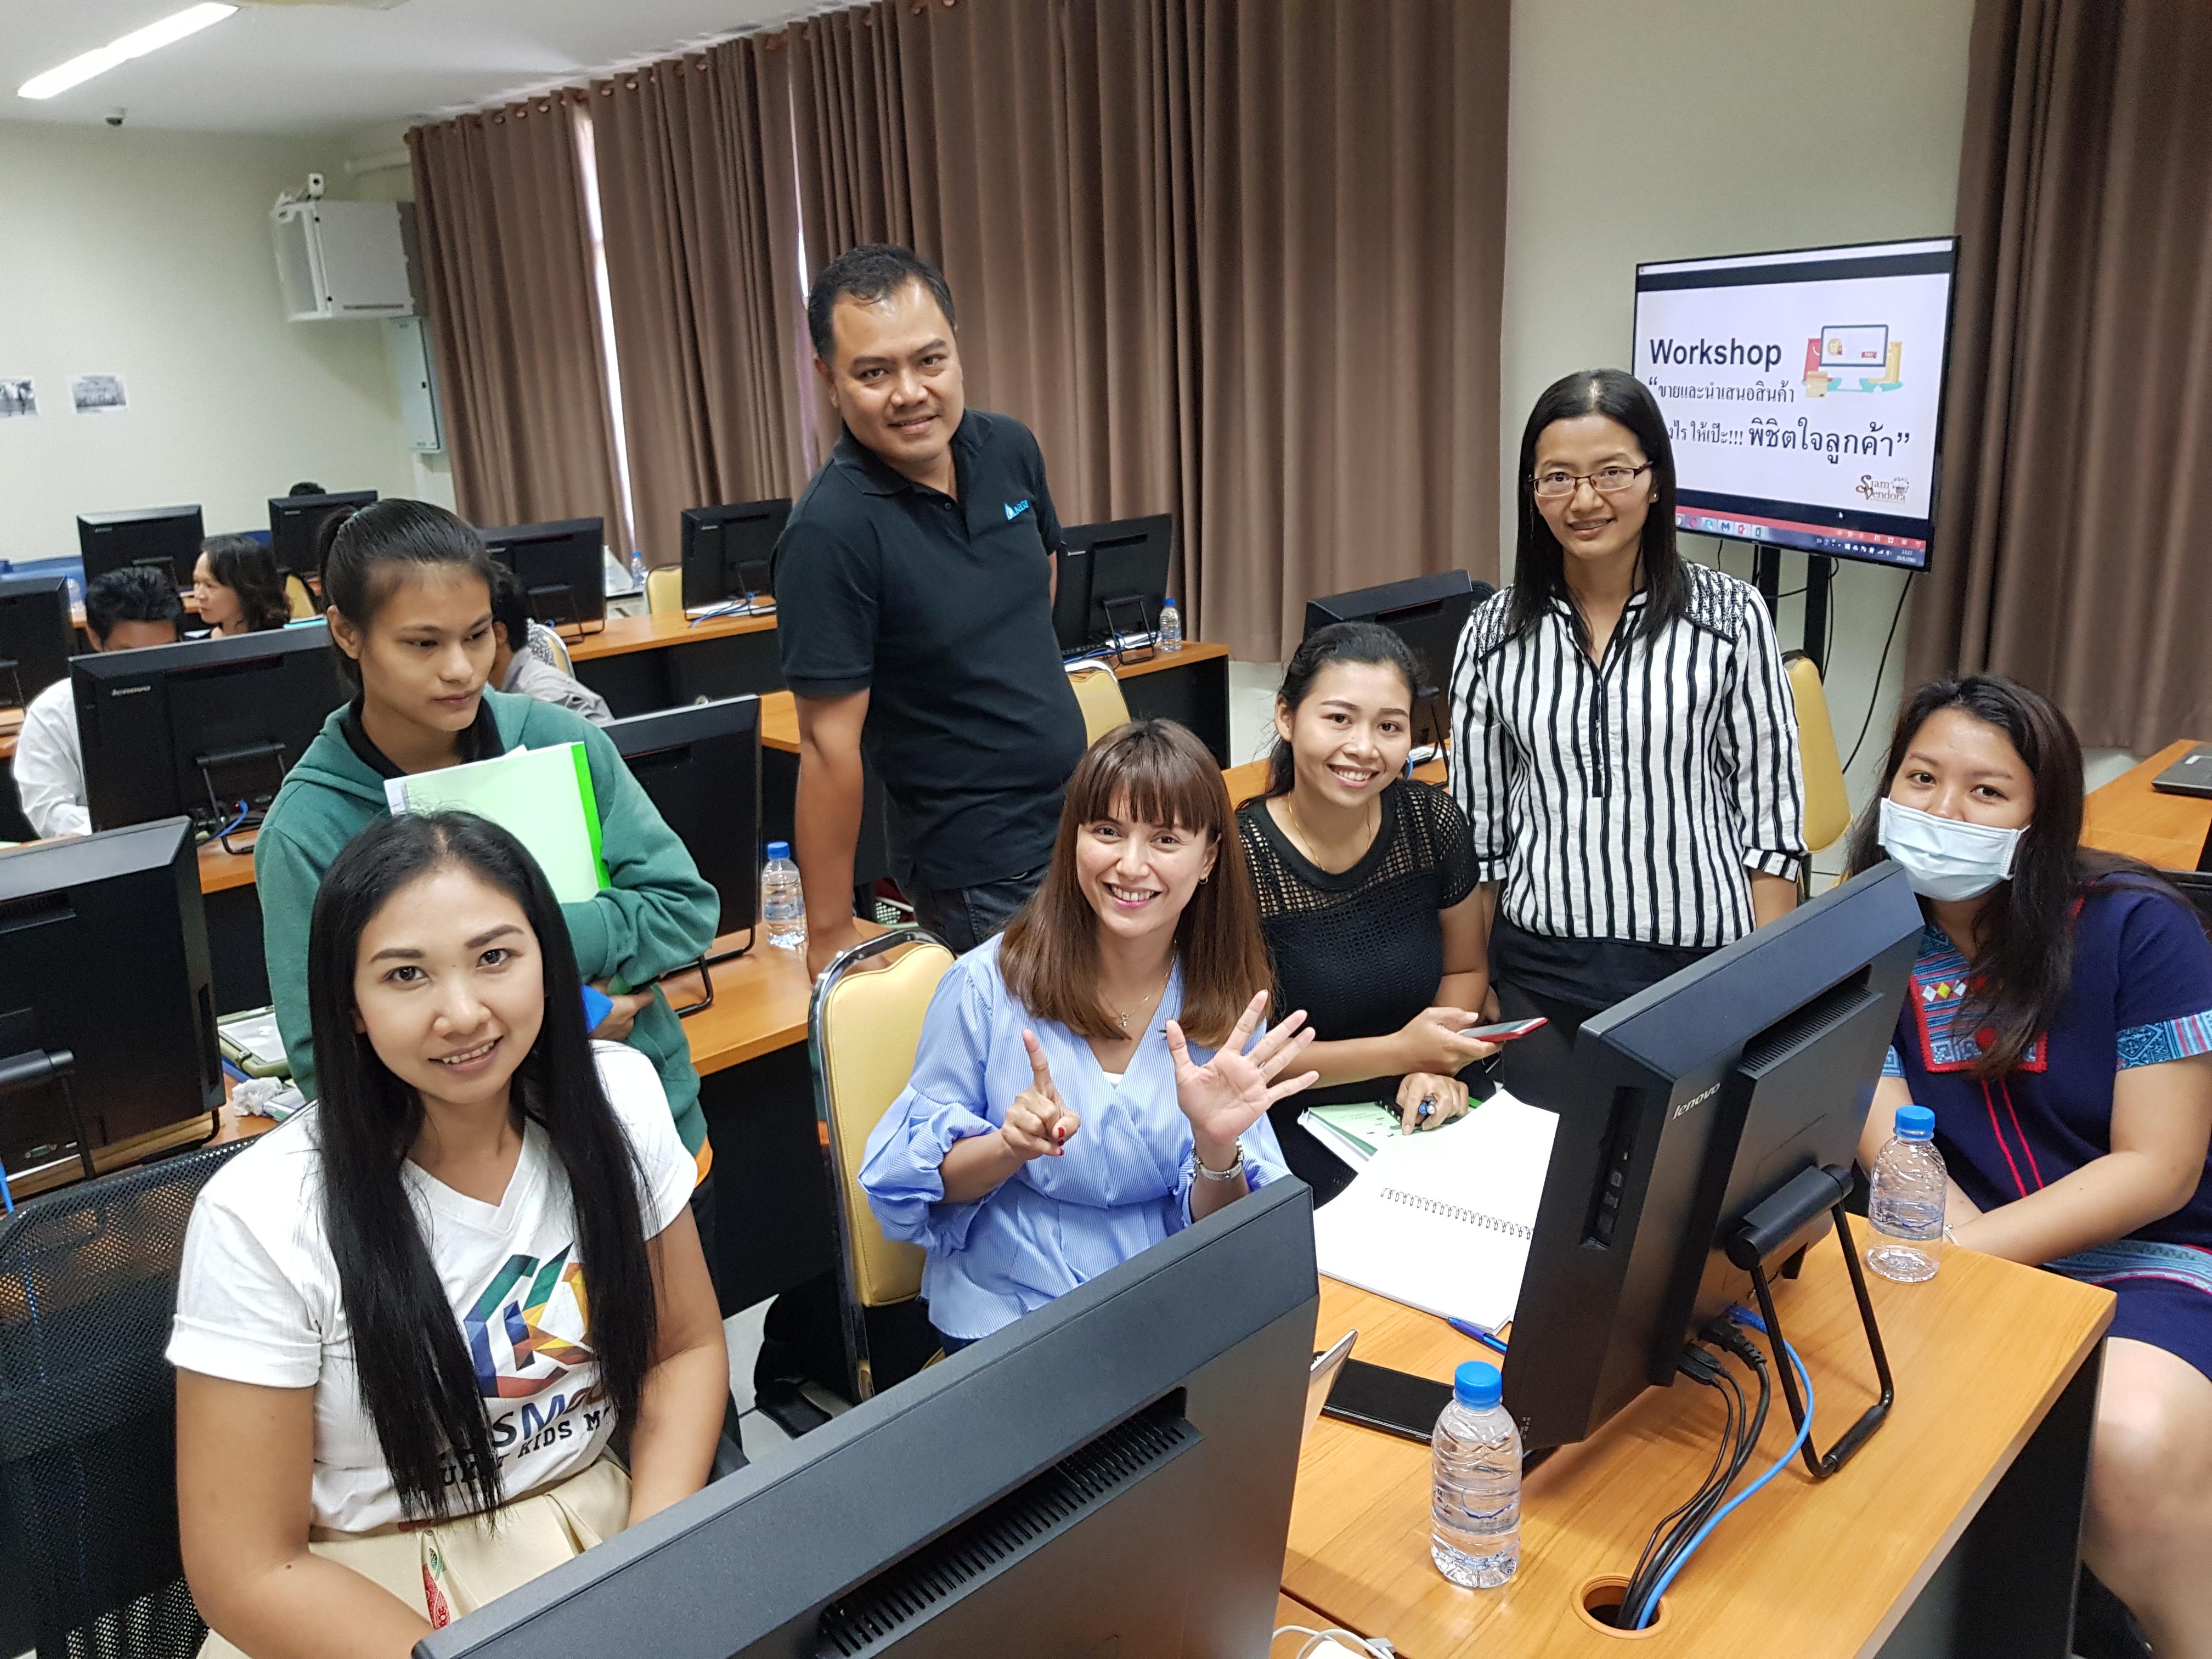 workshop สอนDigital Marketing โดยอาจารย์ใบตอง